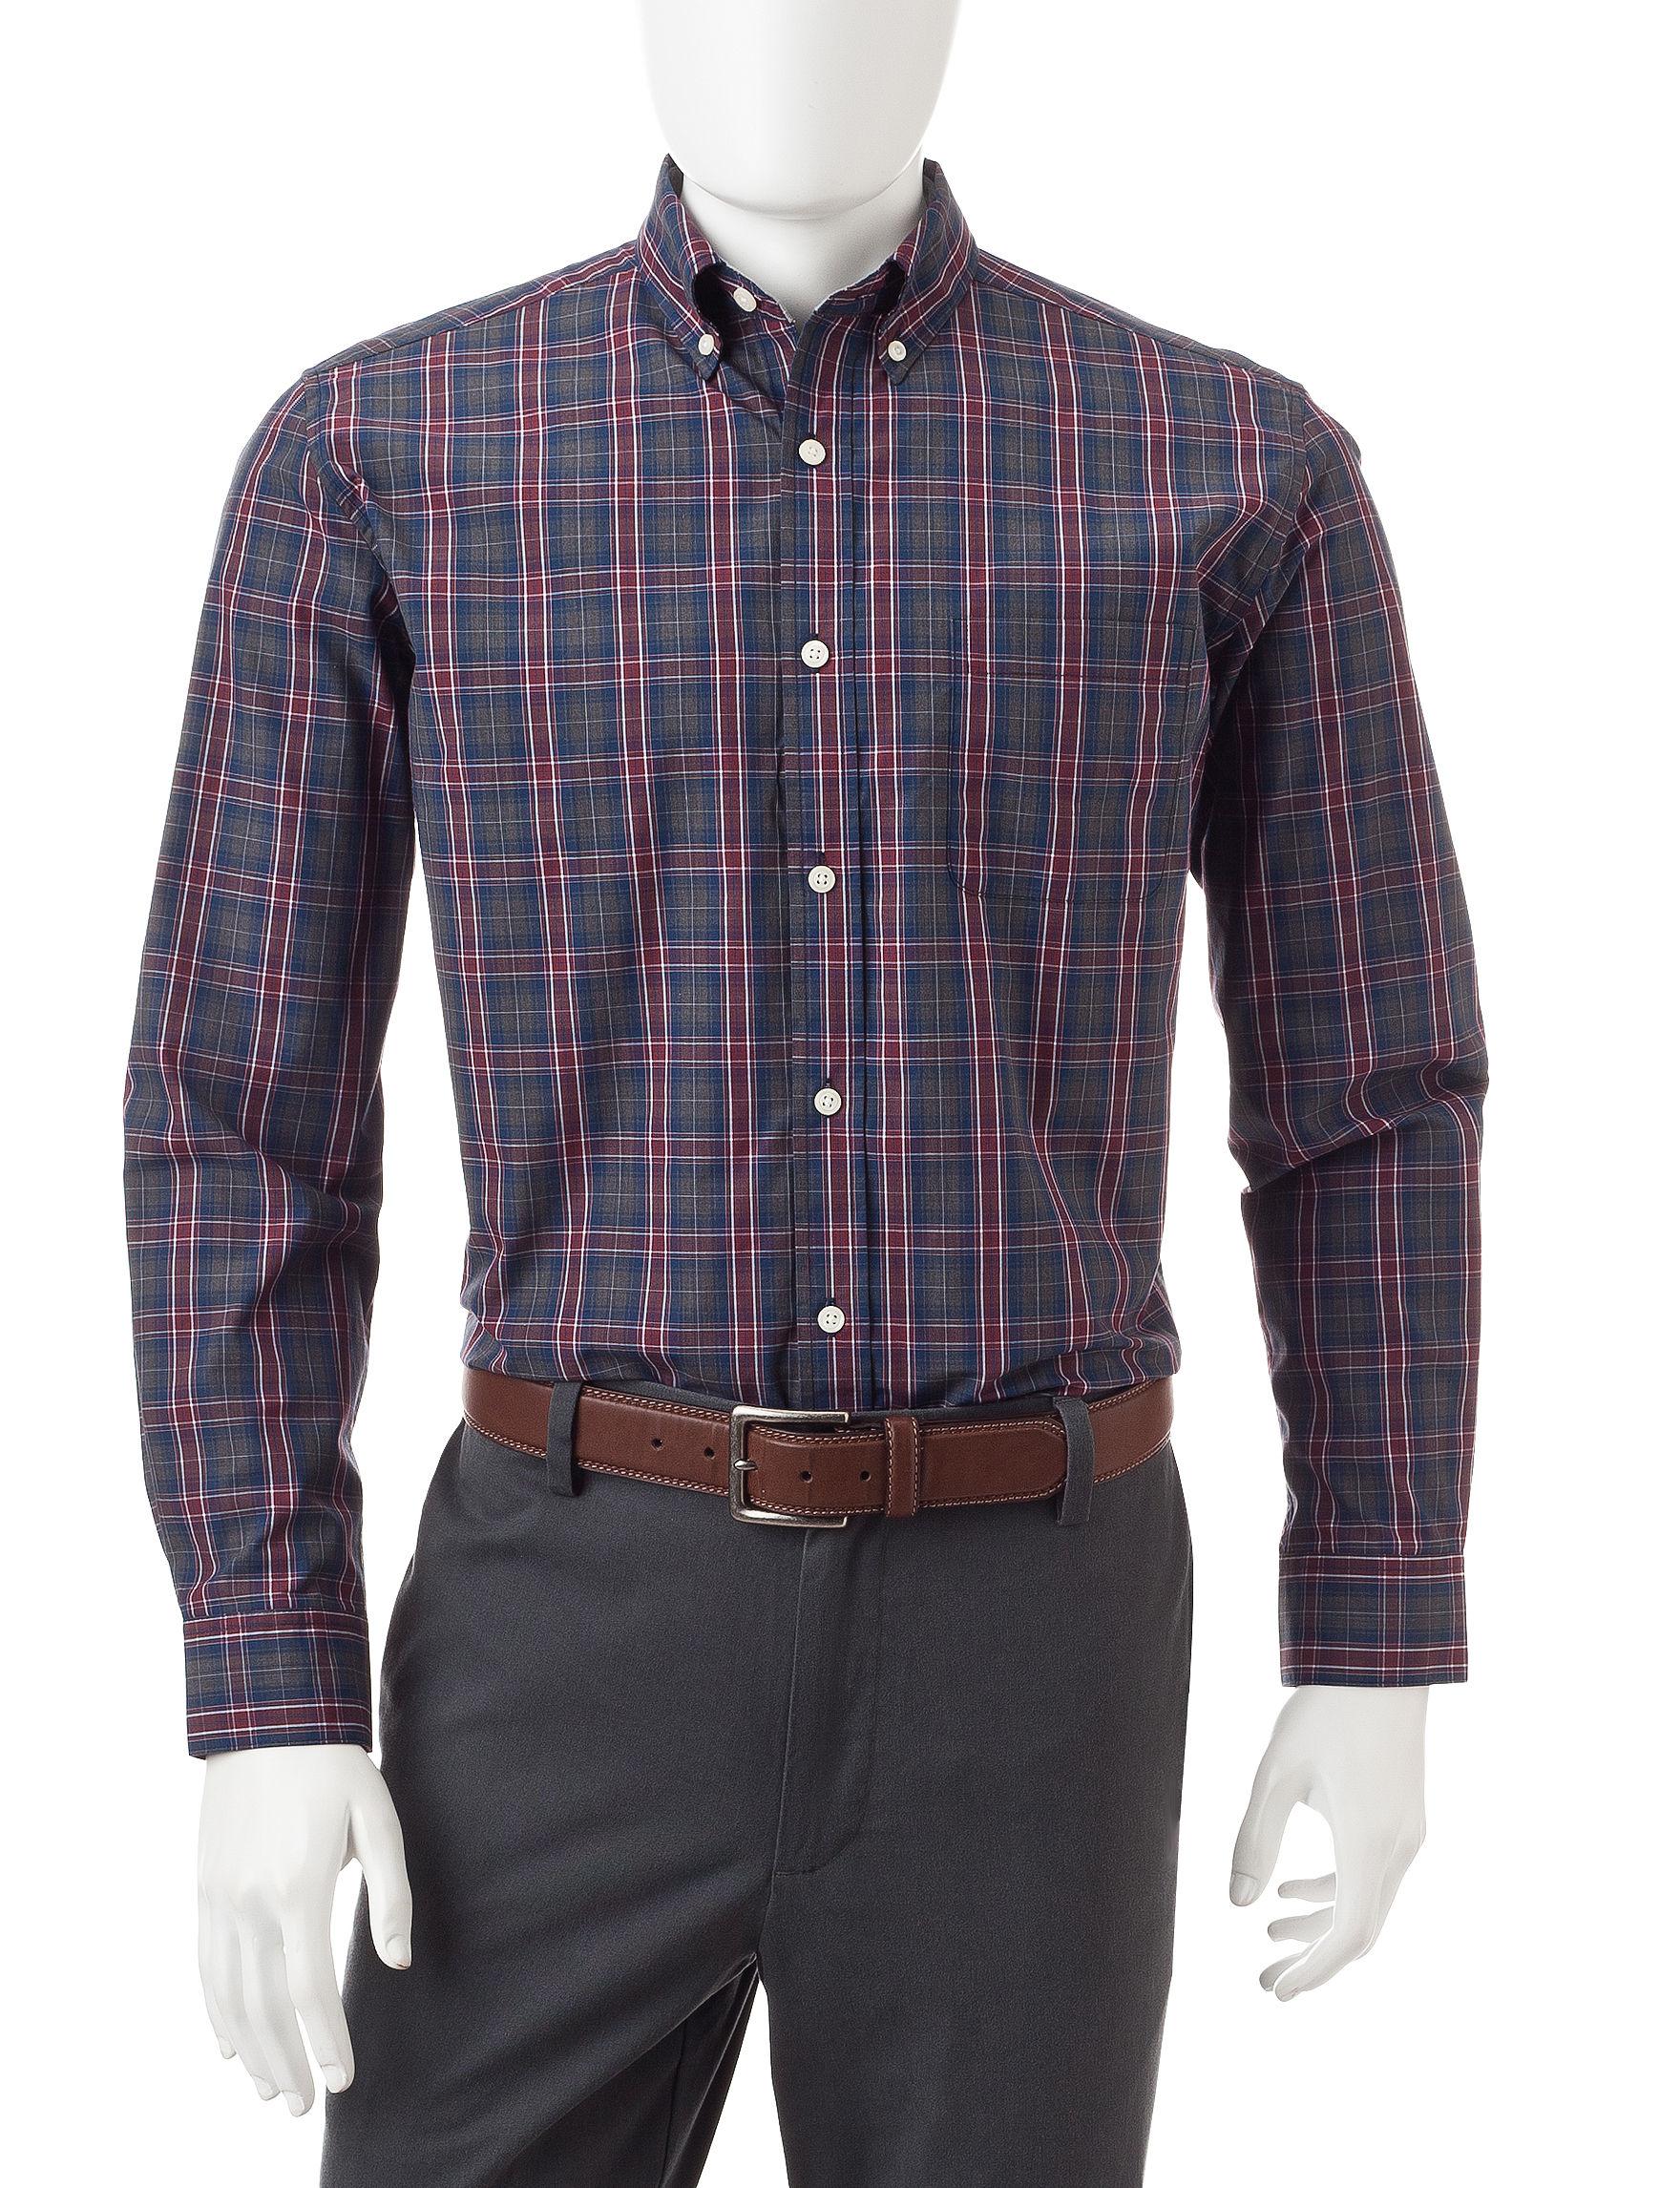 U.S. Polo Assn. Burgundy Casual Button Down Shirts